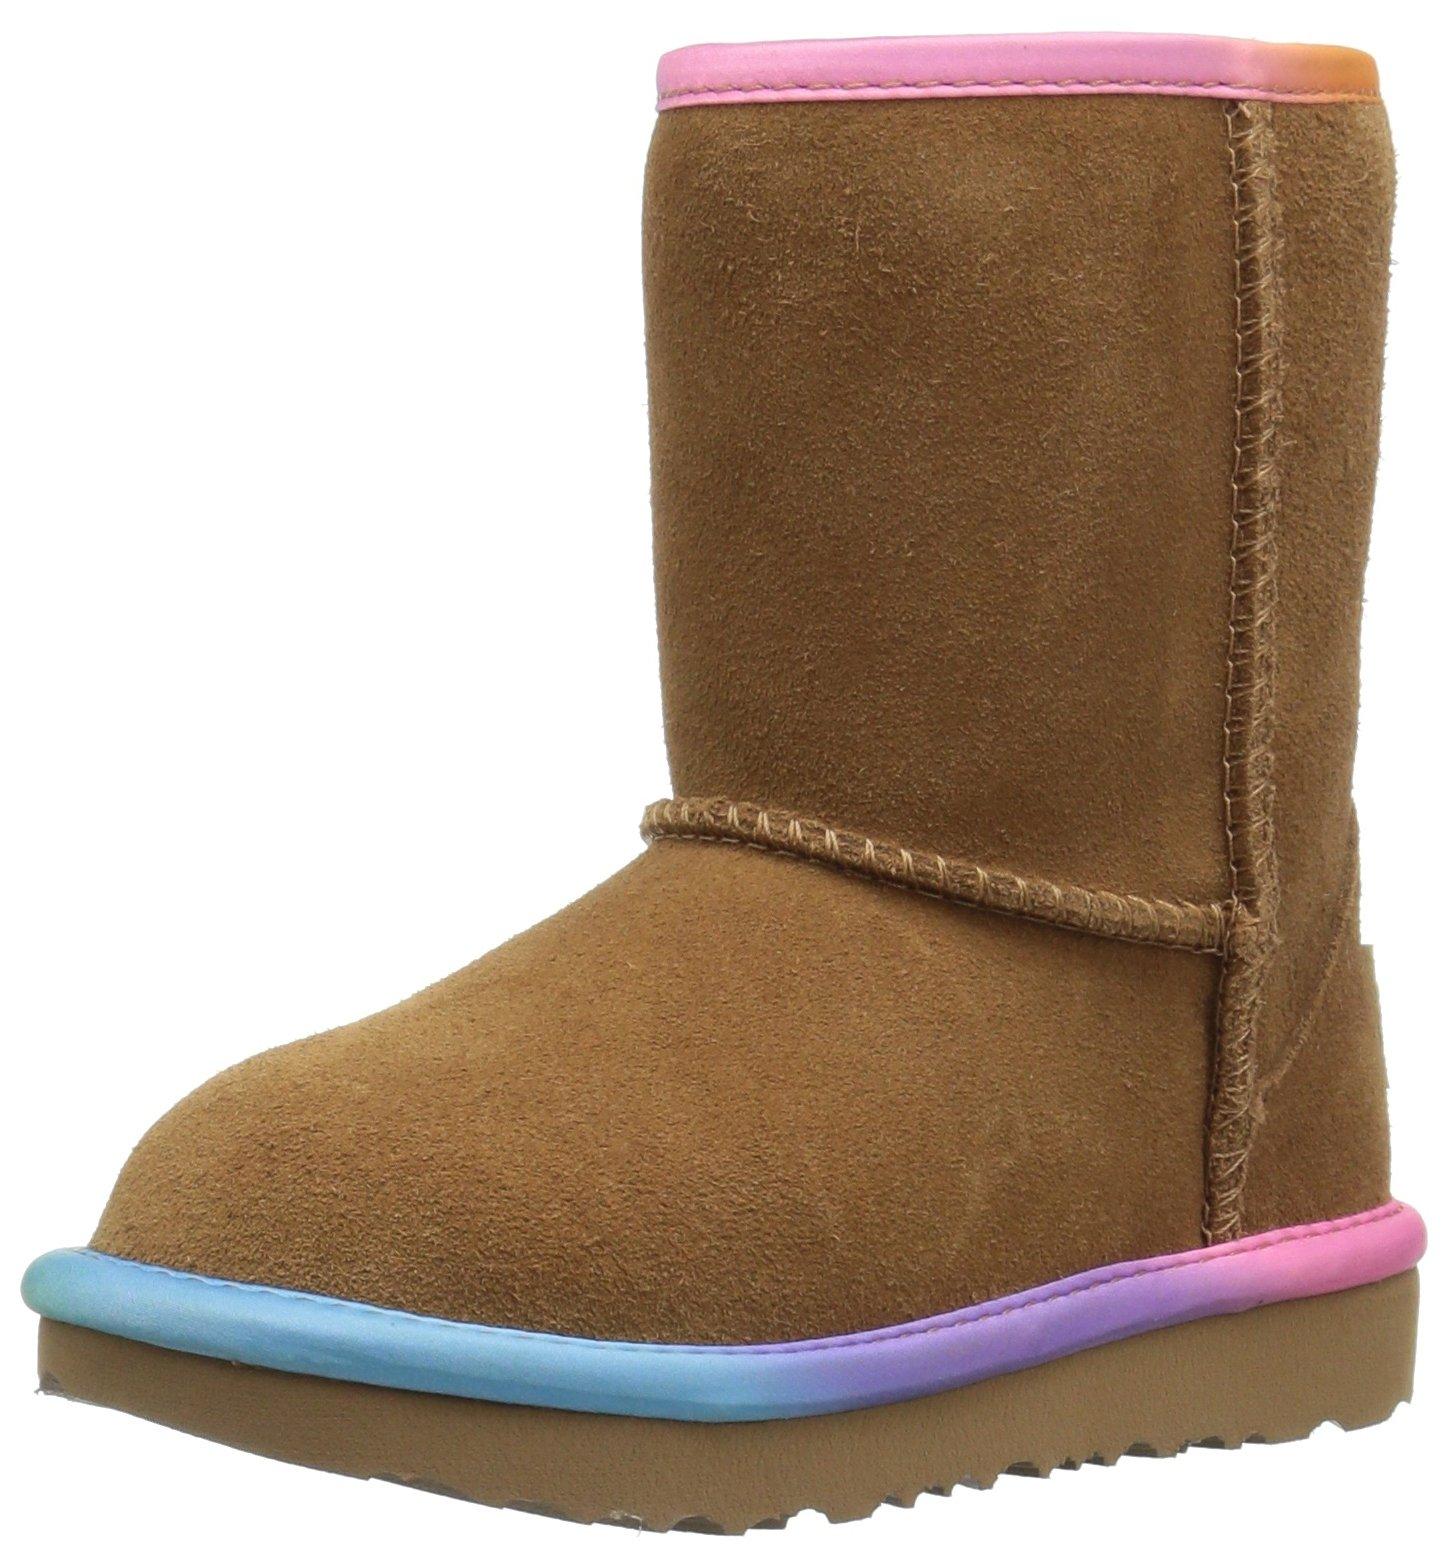 37113d26362 Galleon - UGG Girls T Classic Short II Rainbow Pull-on Boot ...